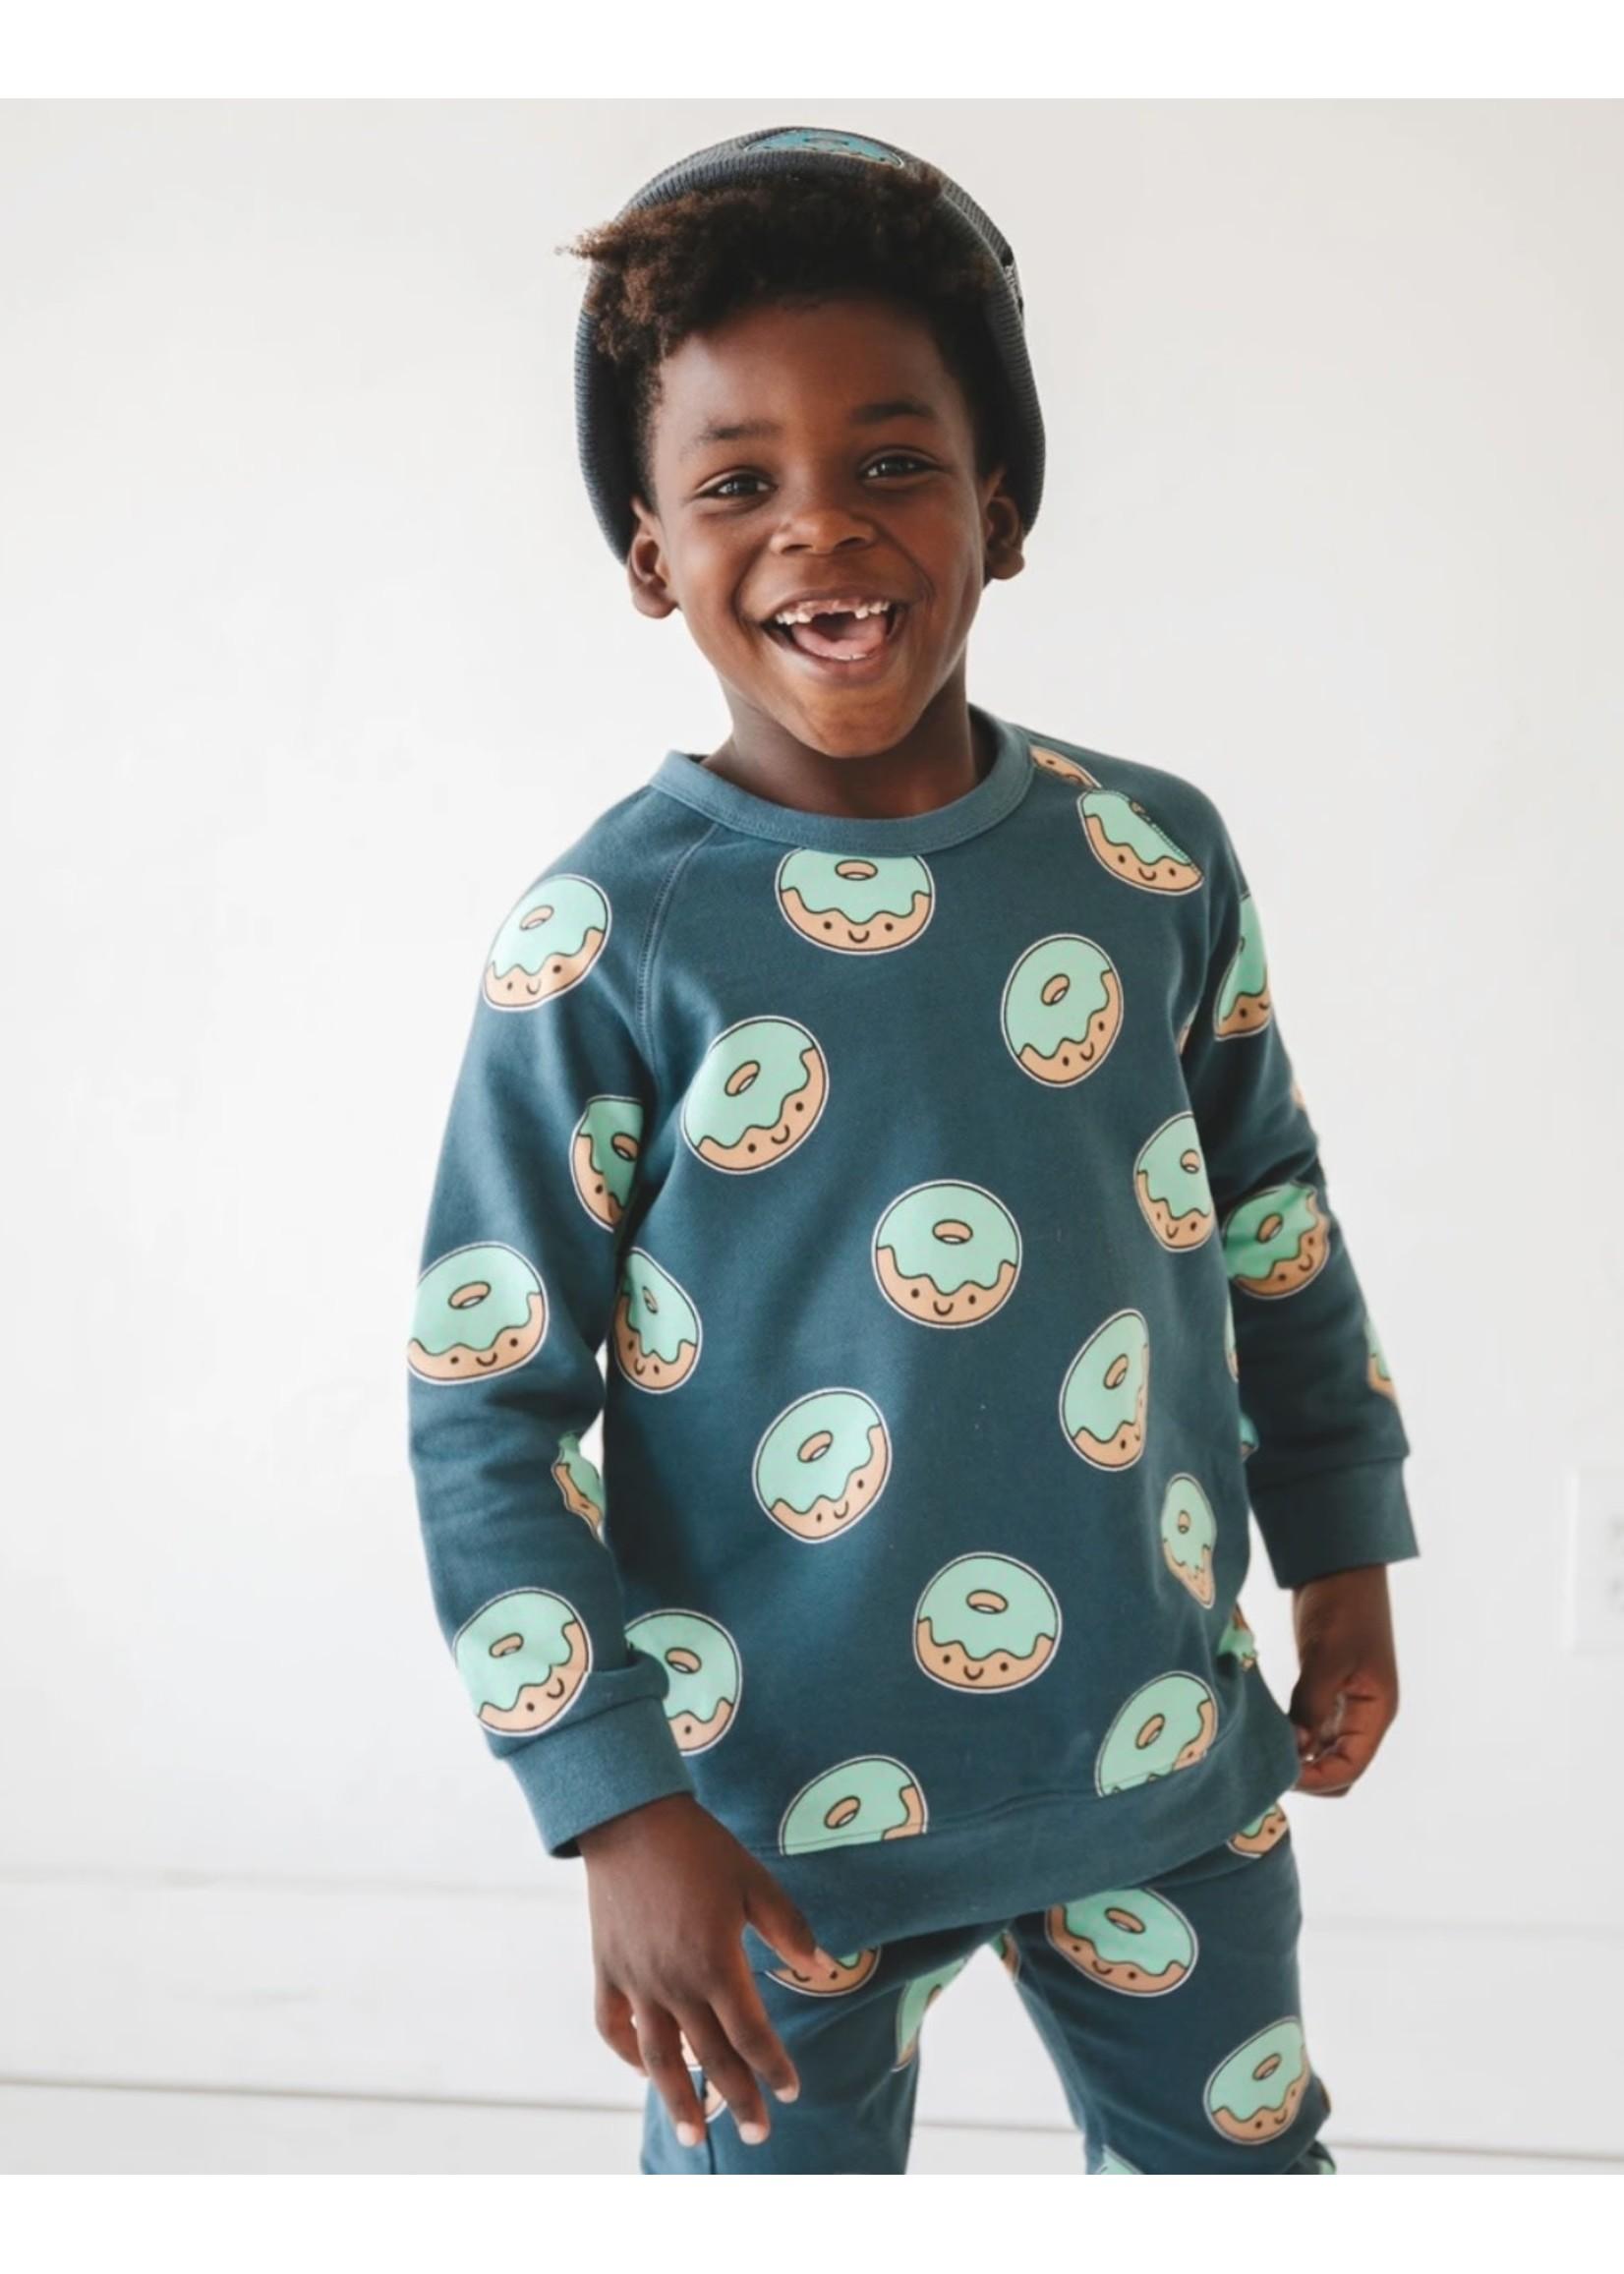 Whistle & Flute Whistle & Flute, Kawaii Donut Allover Print Sweatshirt